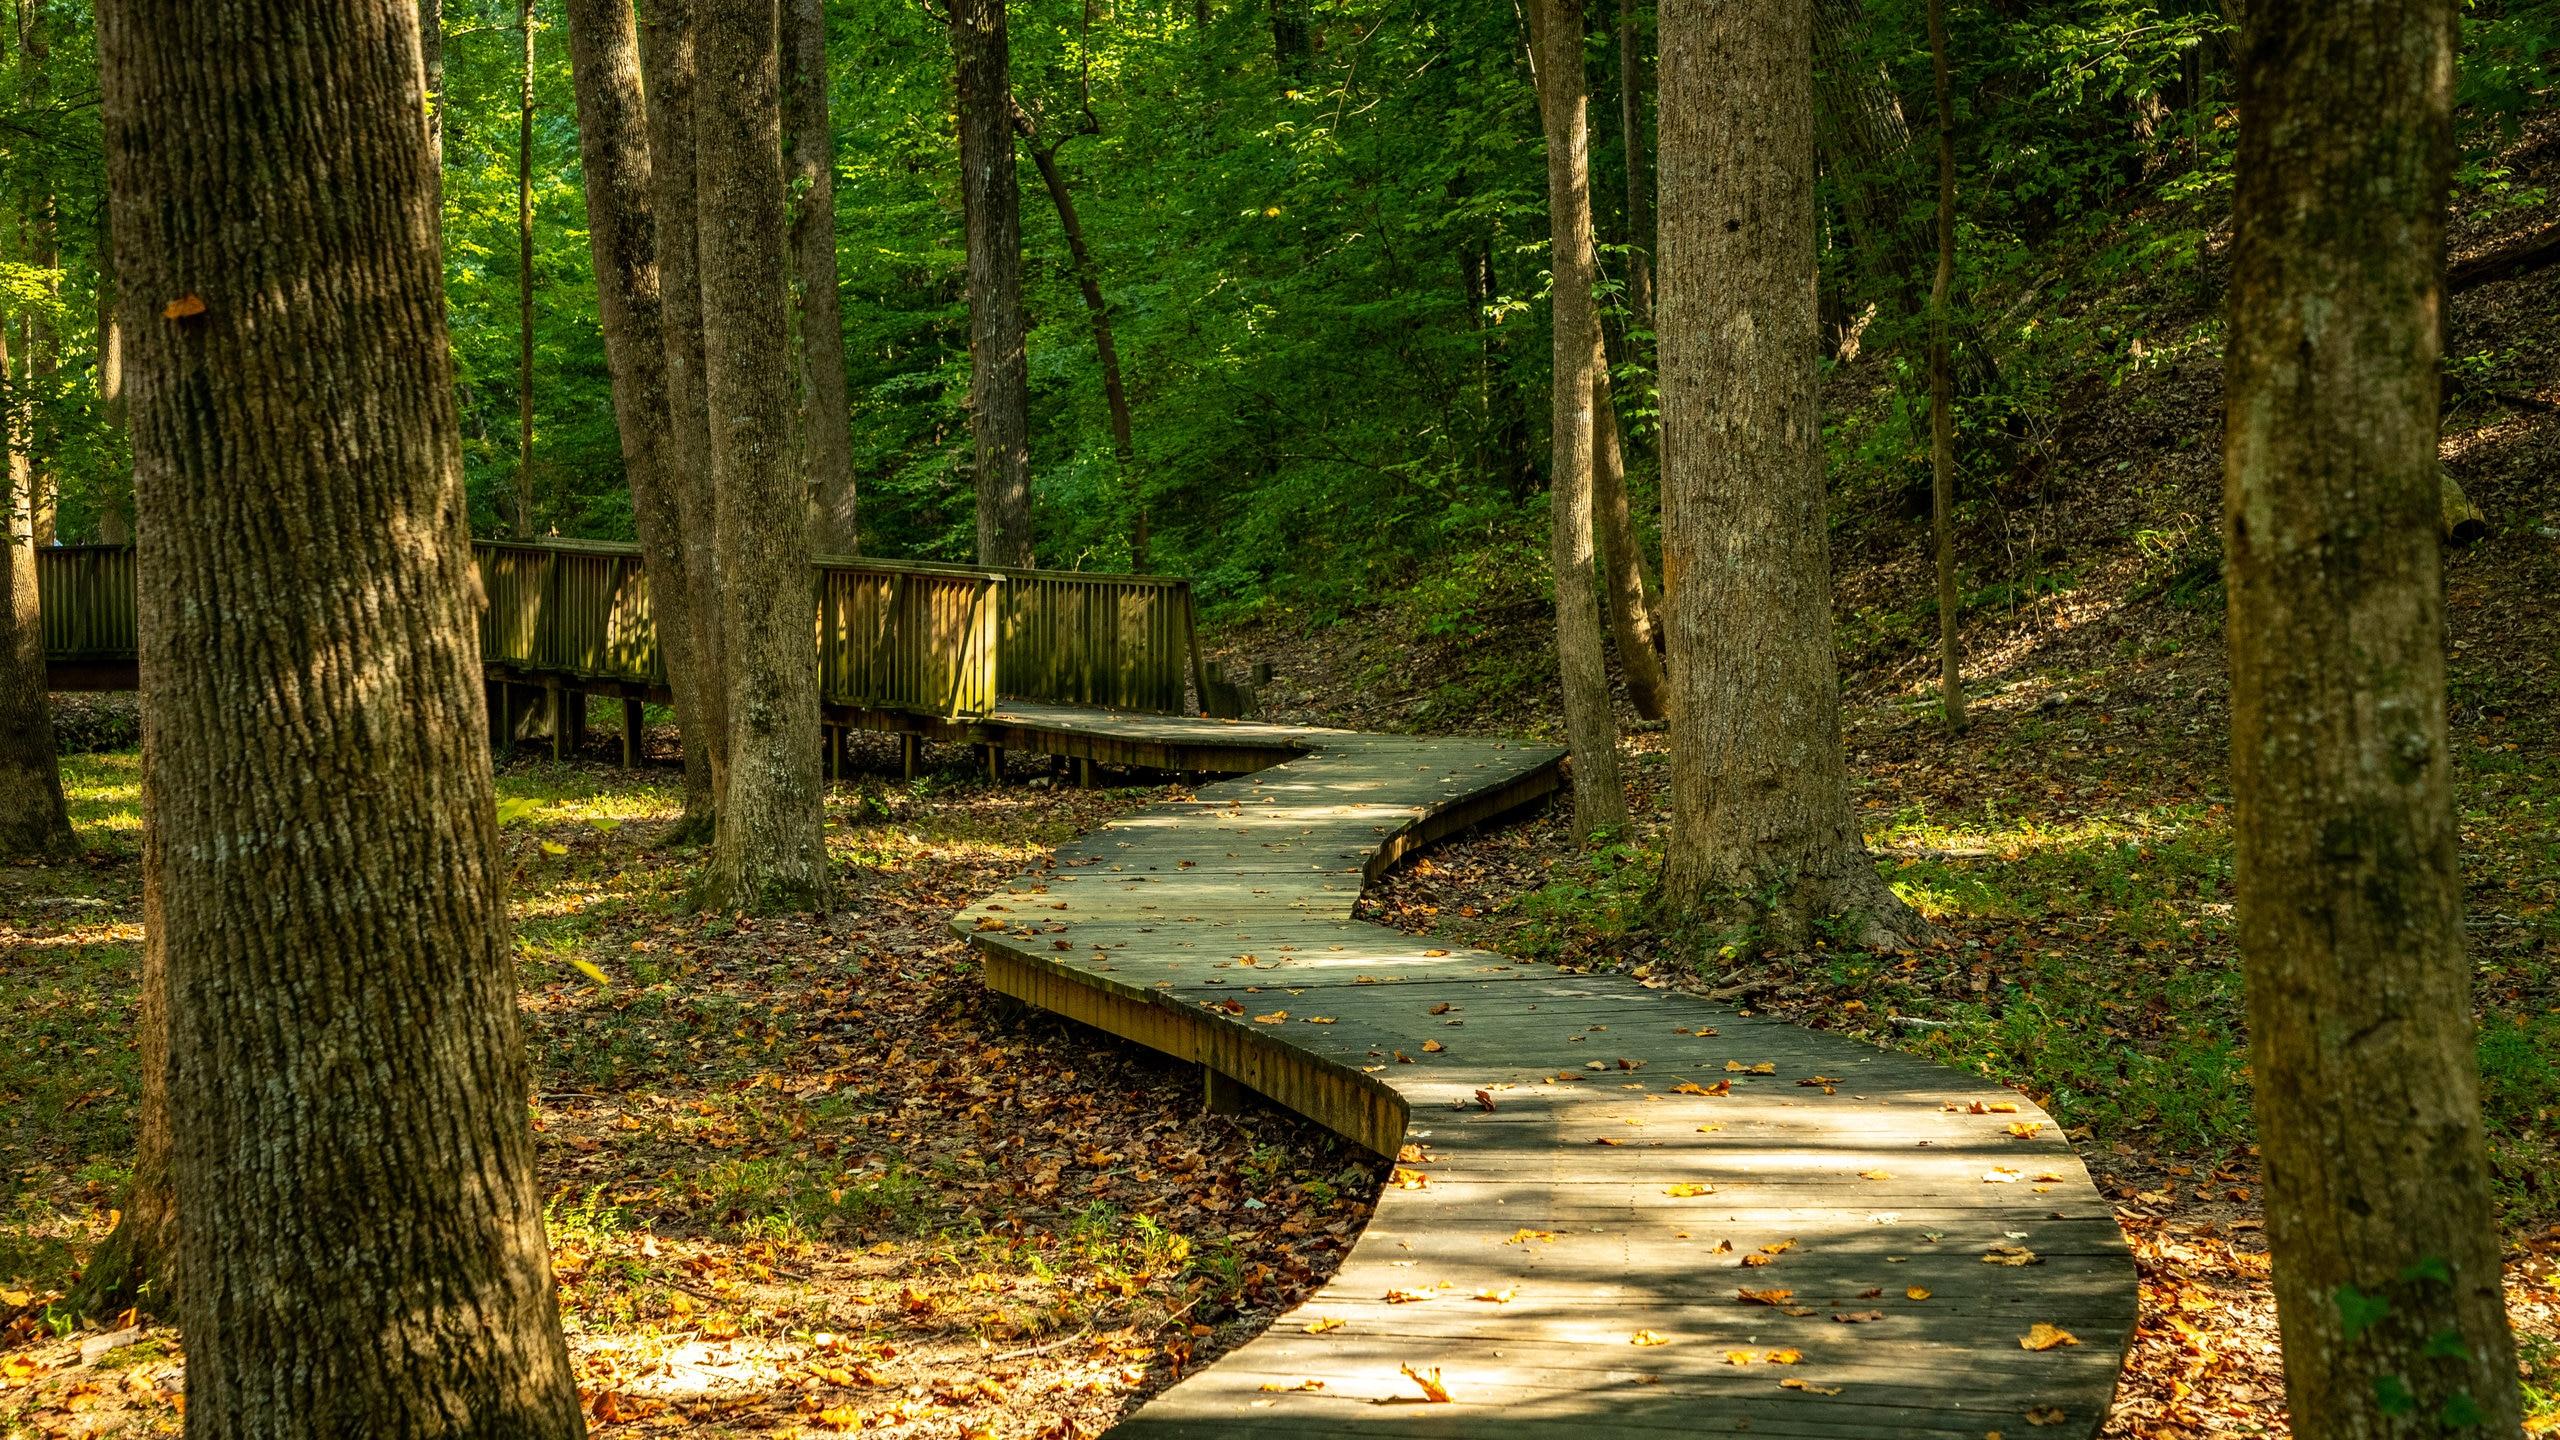 Wilshire Trails Park, Gainesville, Georgia, USA